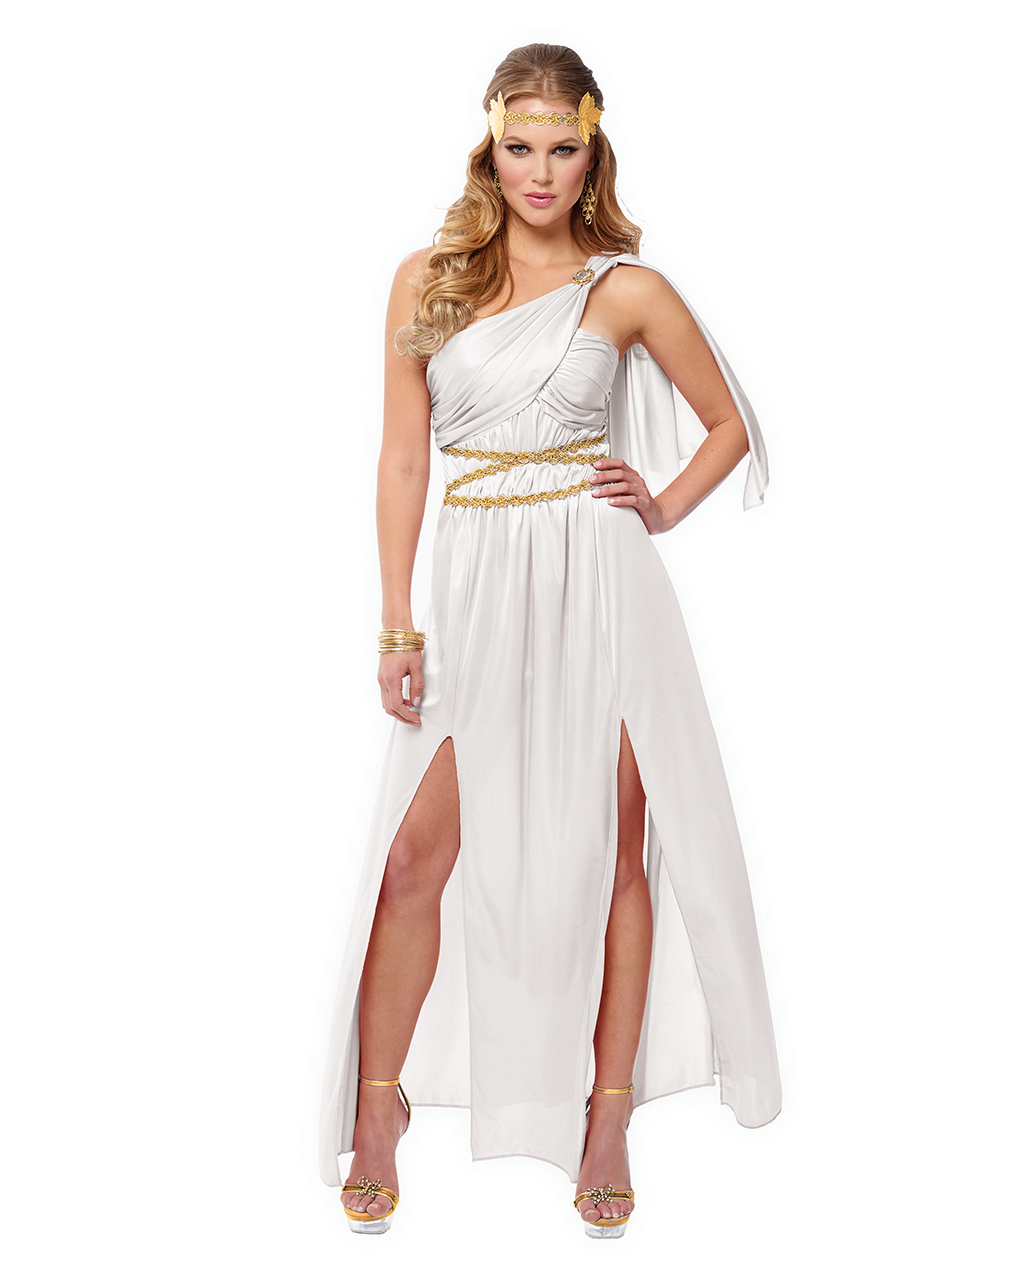 Greek Goddess Athena or Aphrodite Costume Halloween Fancy Dress